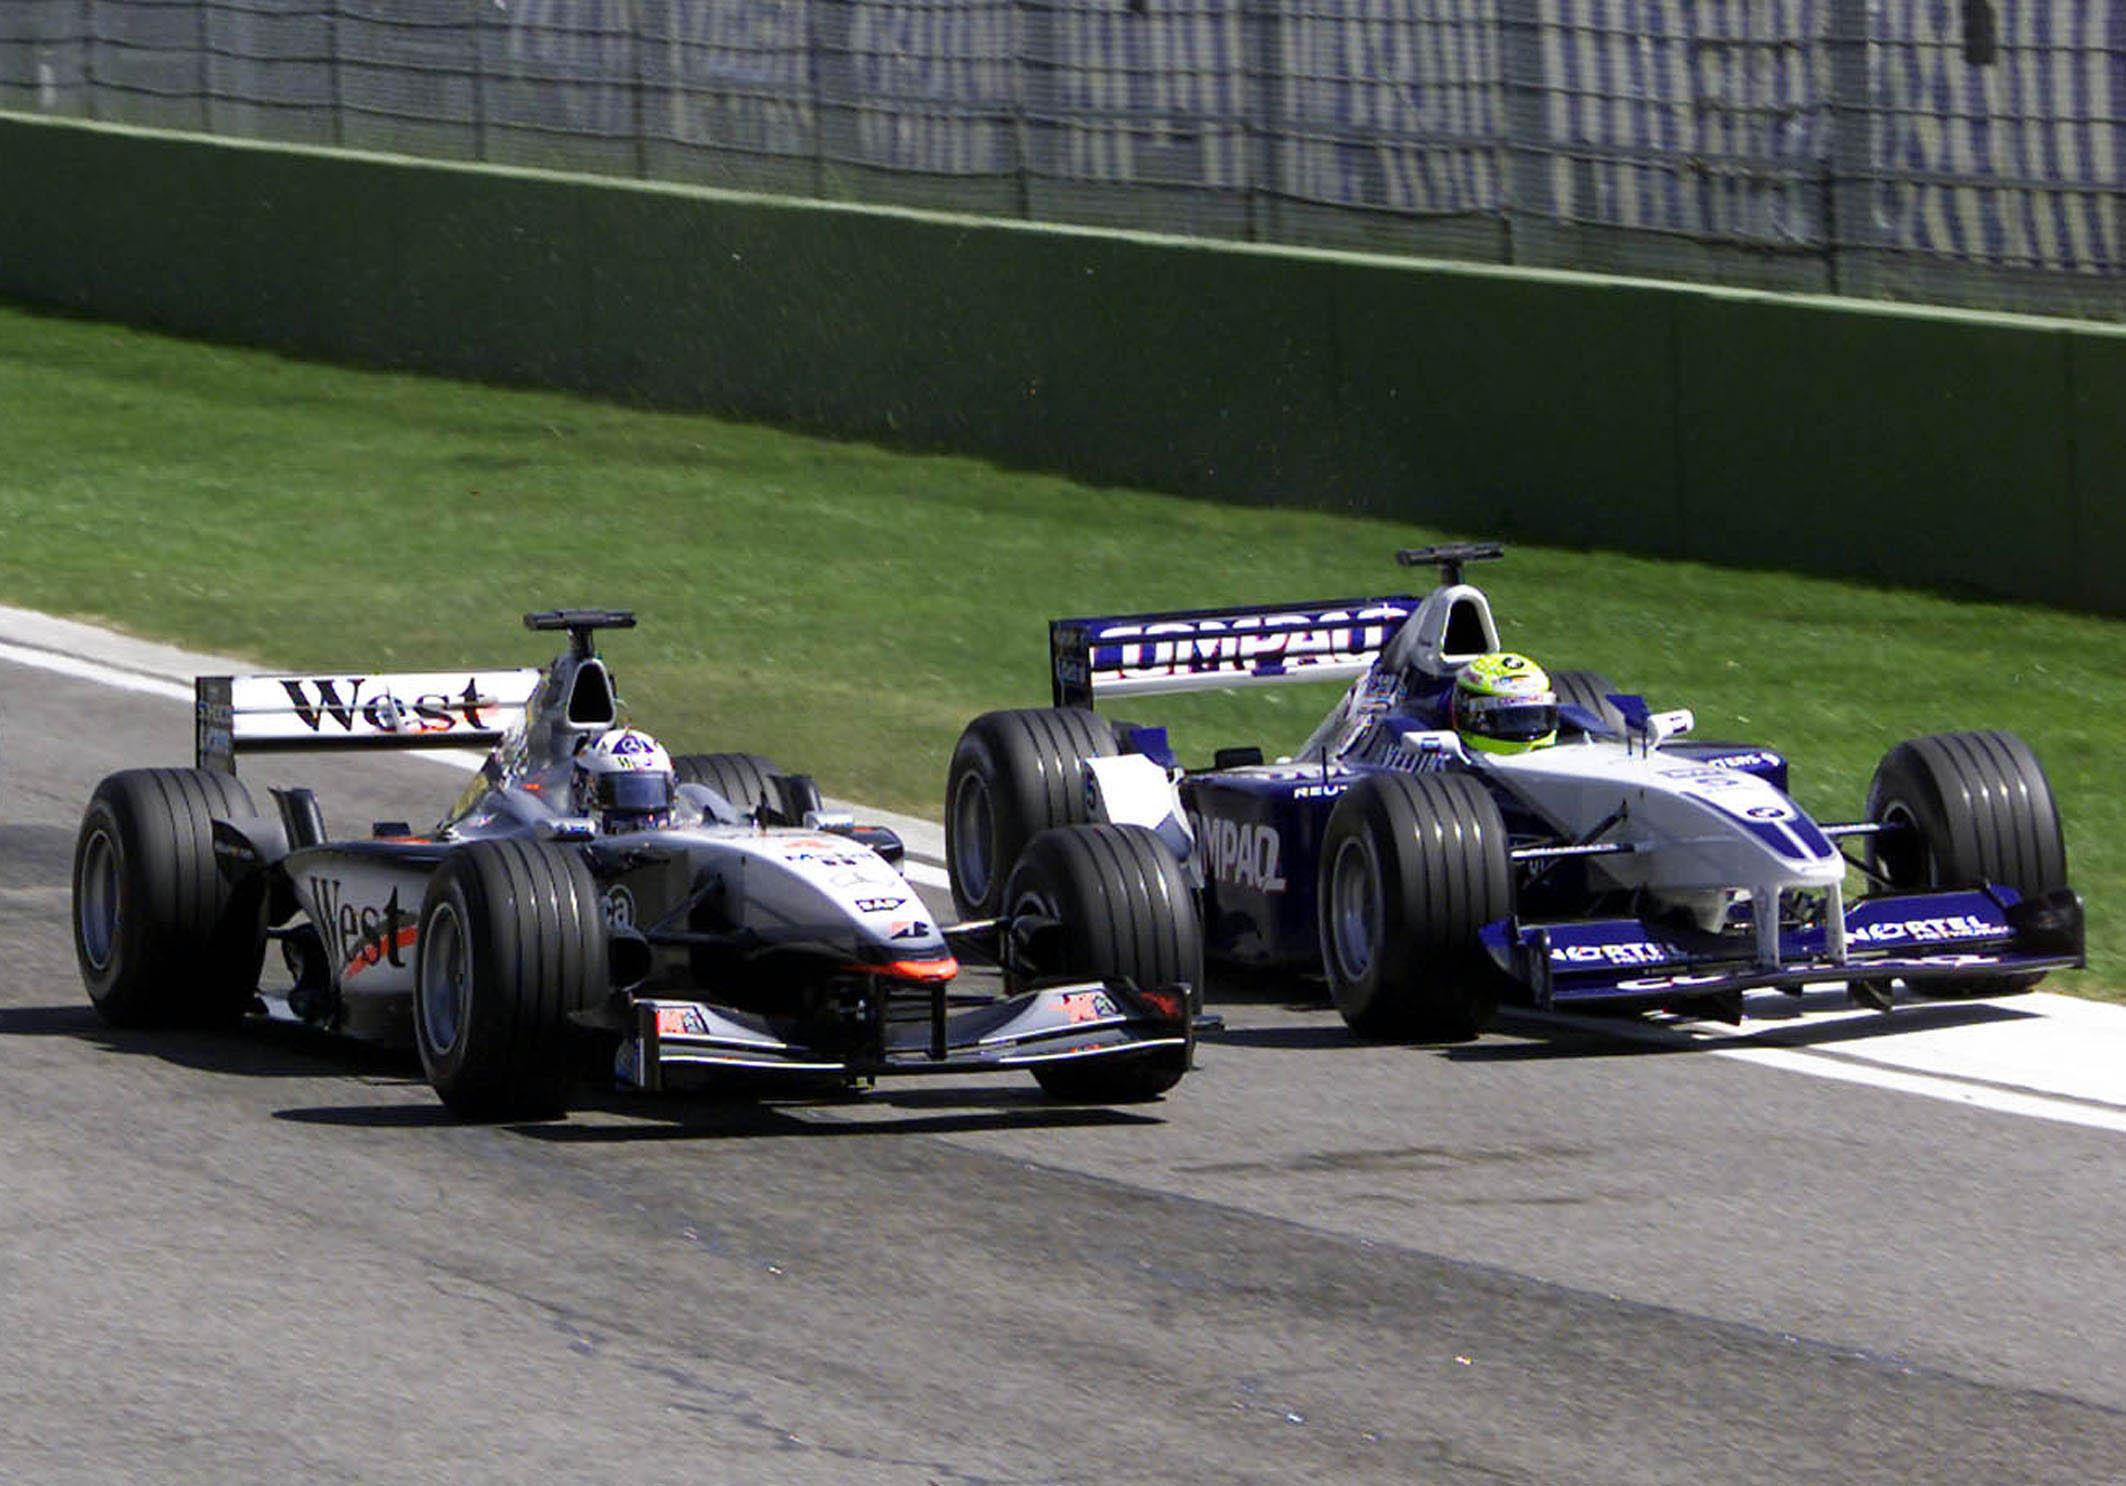 David Coulthard McLaren Ralf Schumacher Williams San Marino Grand Prix 2002 Imola